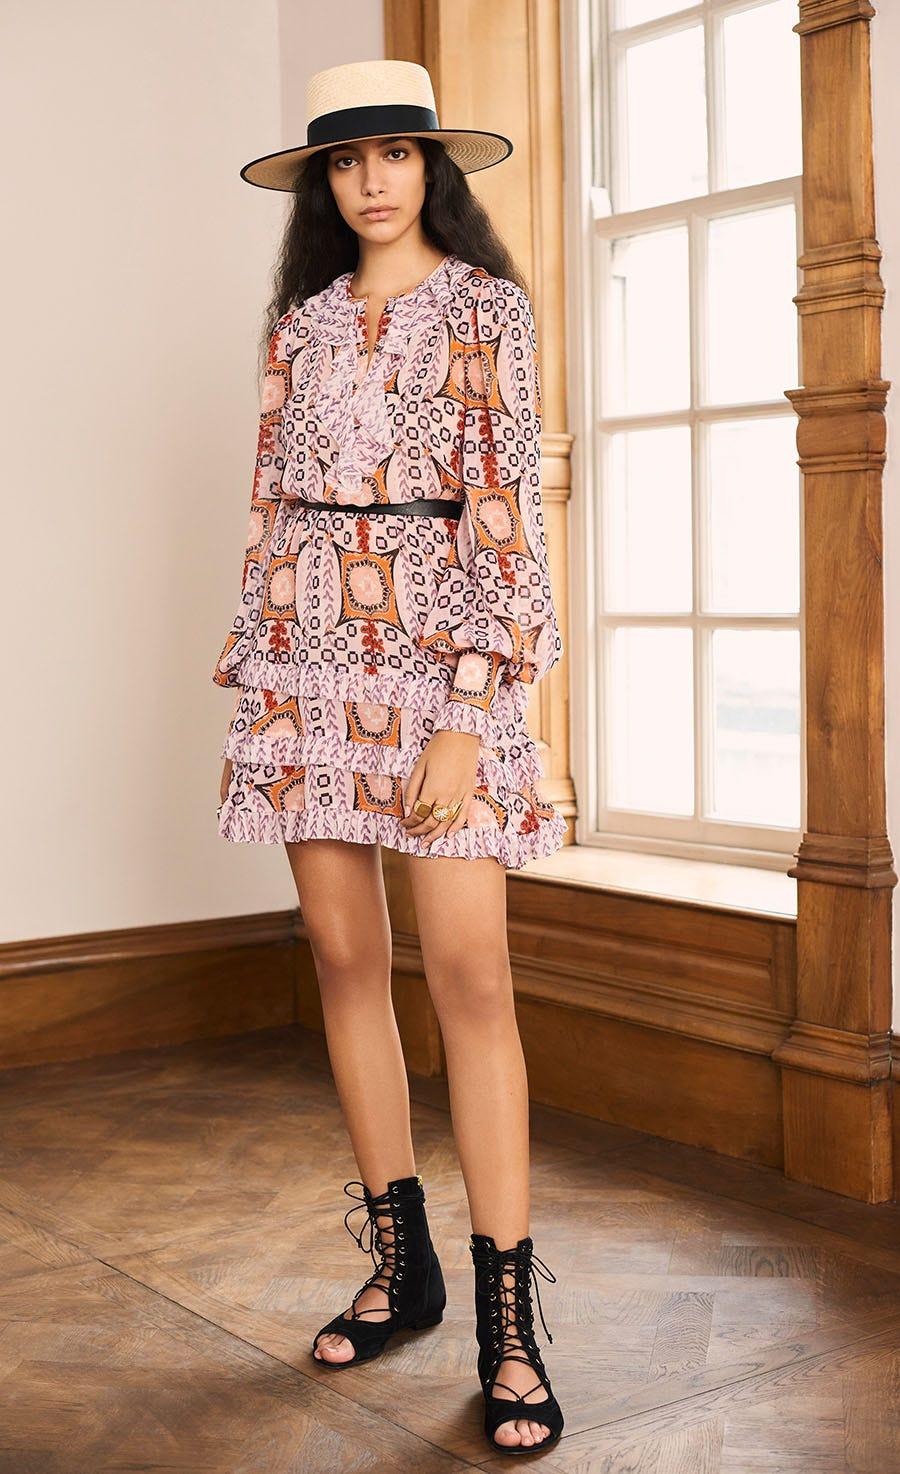 Etoile Printed Mini Dress